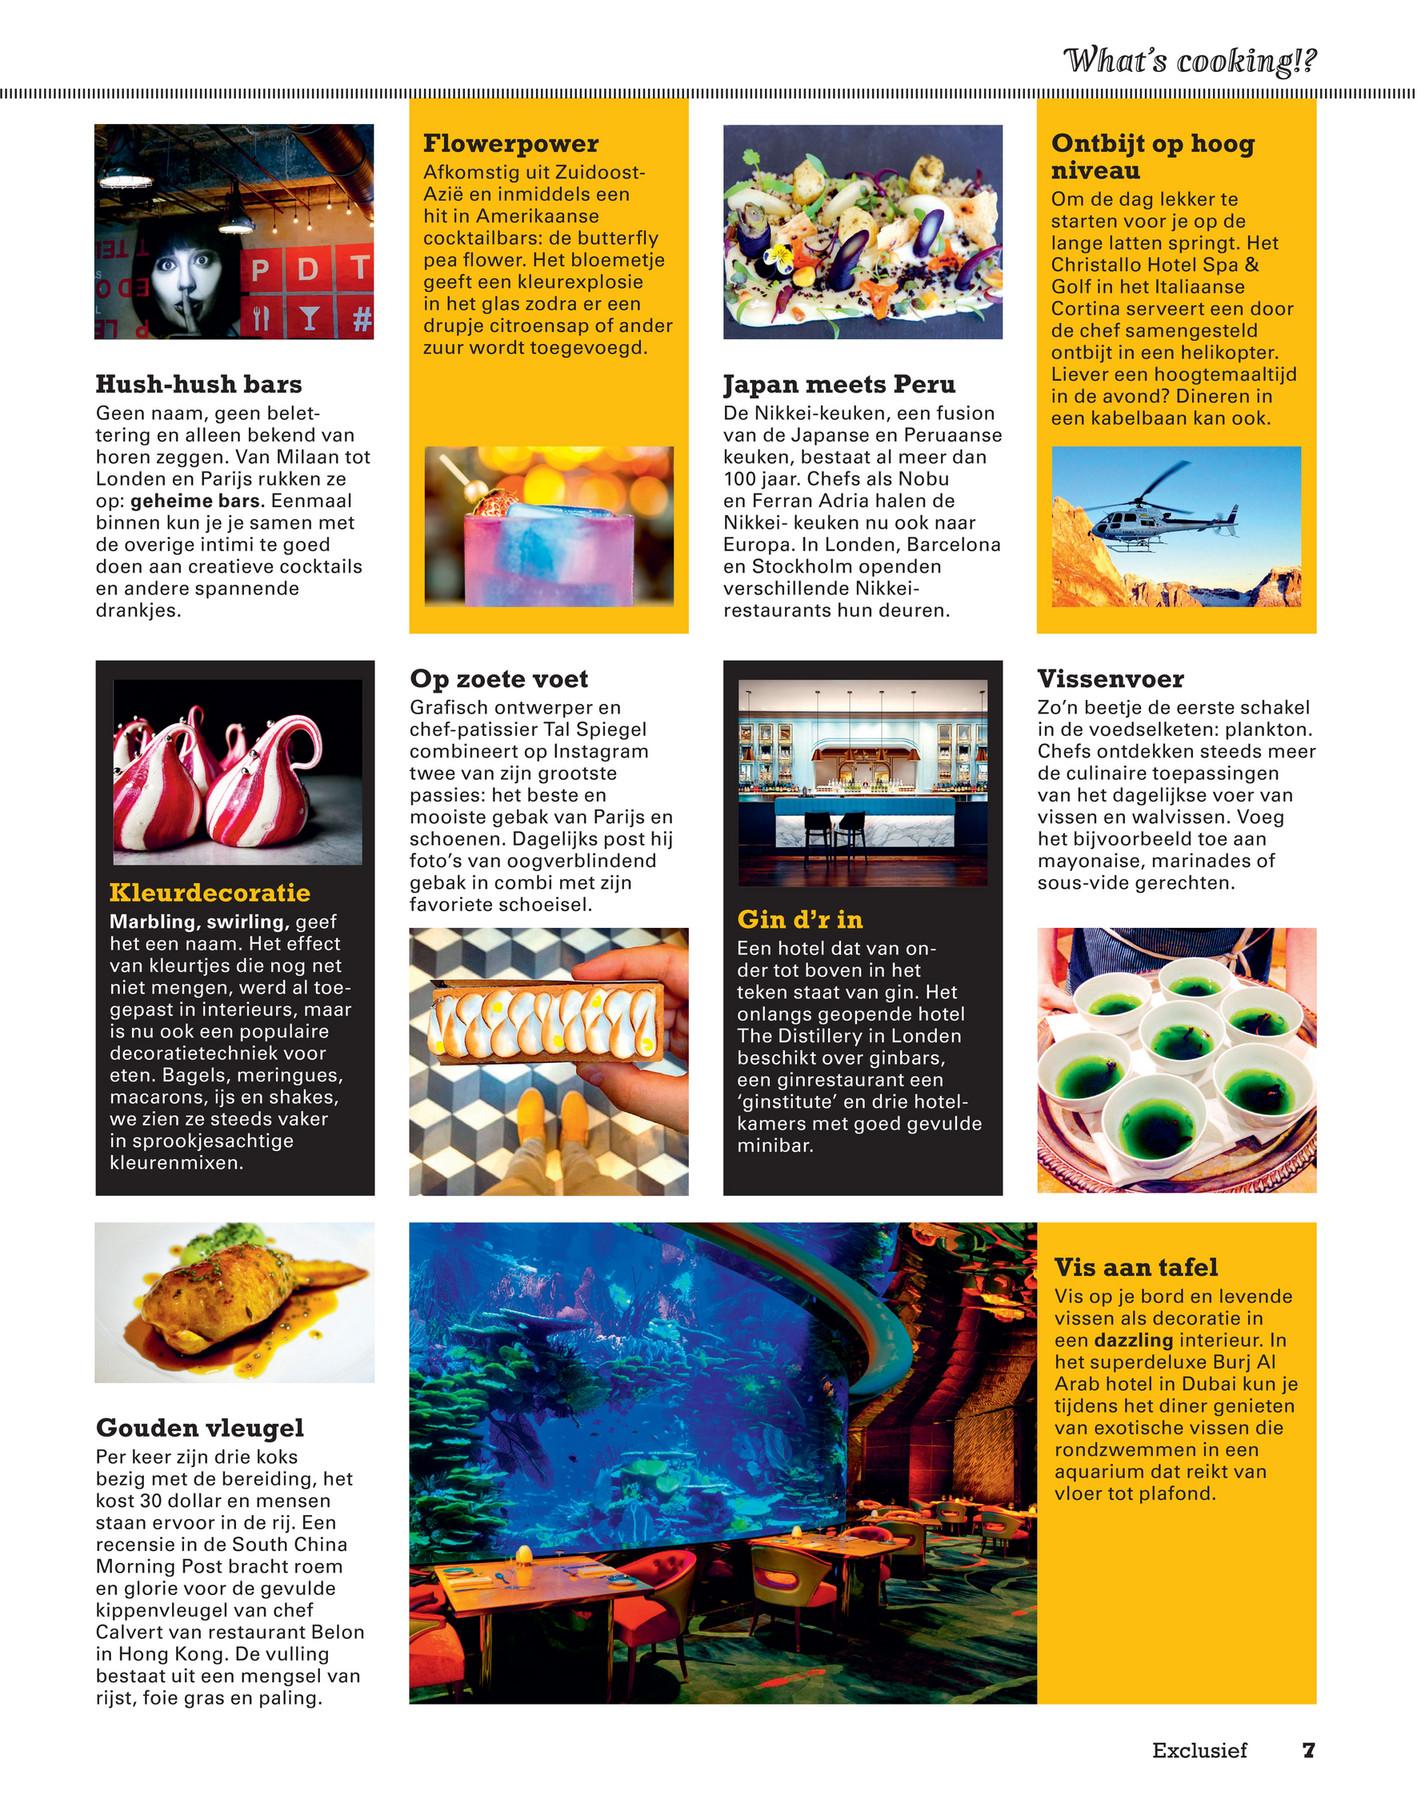 Sligro Exclusief Magazine 02 2017 Pagina 8 9